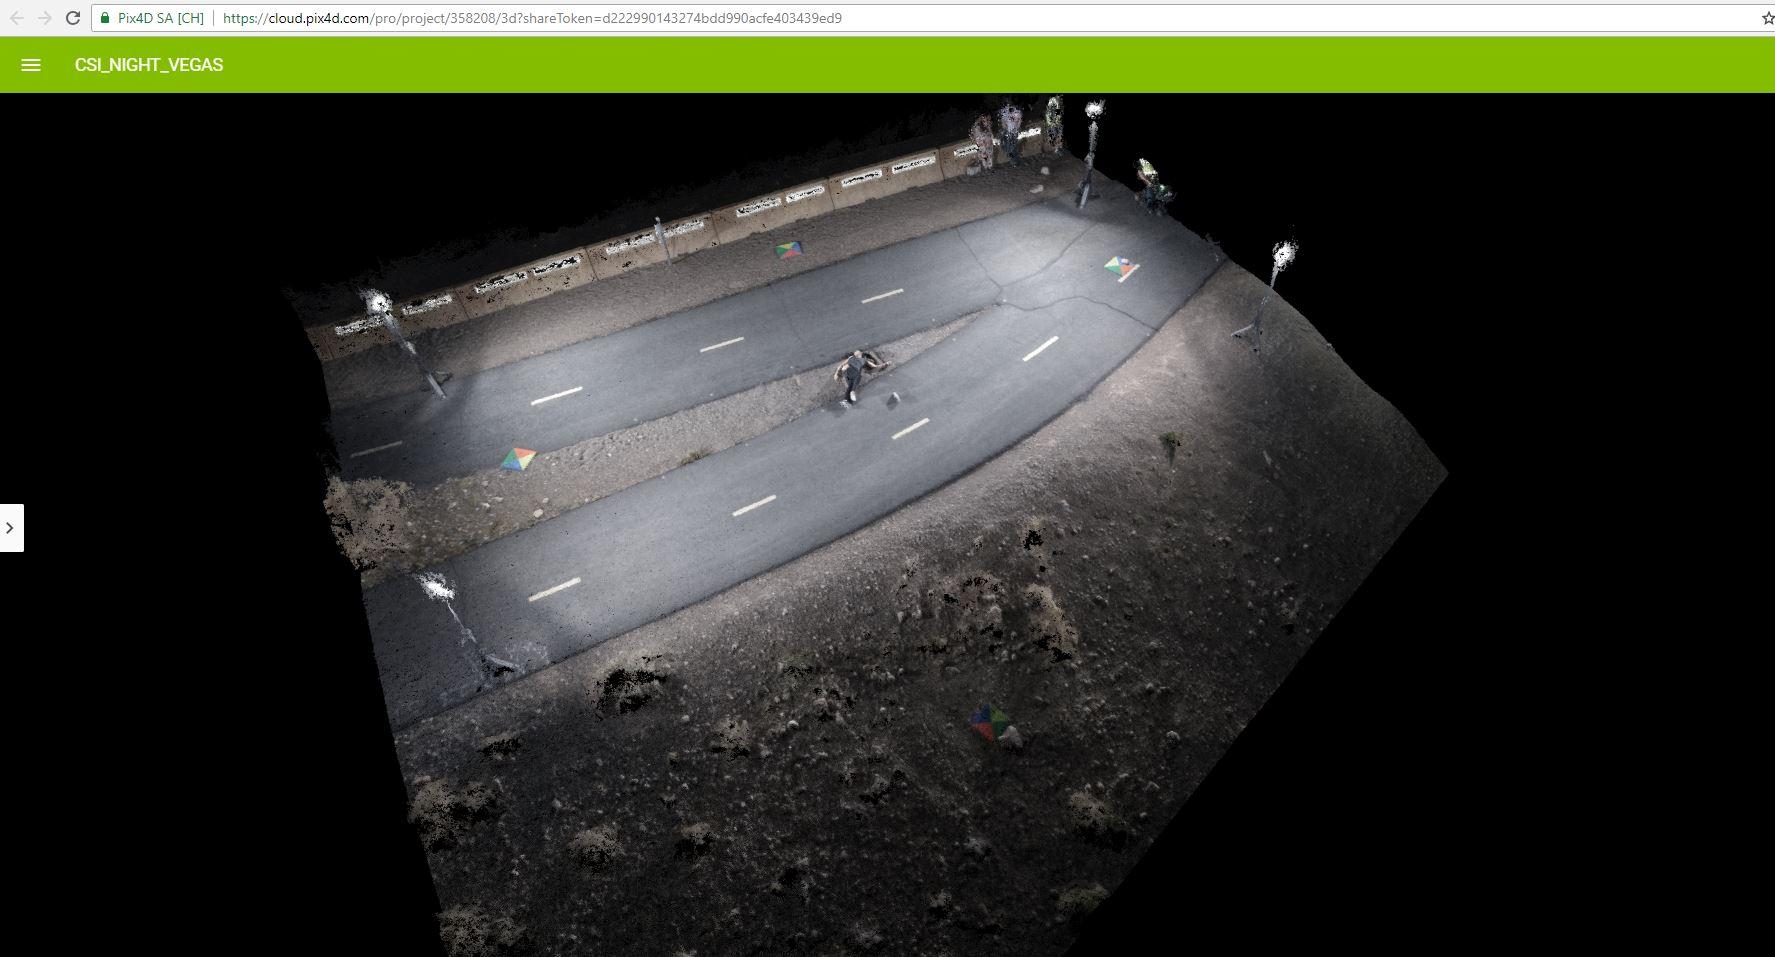 Night (Drone) CSI Demonstration/training with FoxFury & Pix4D (FREE